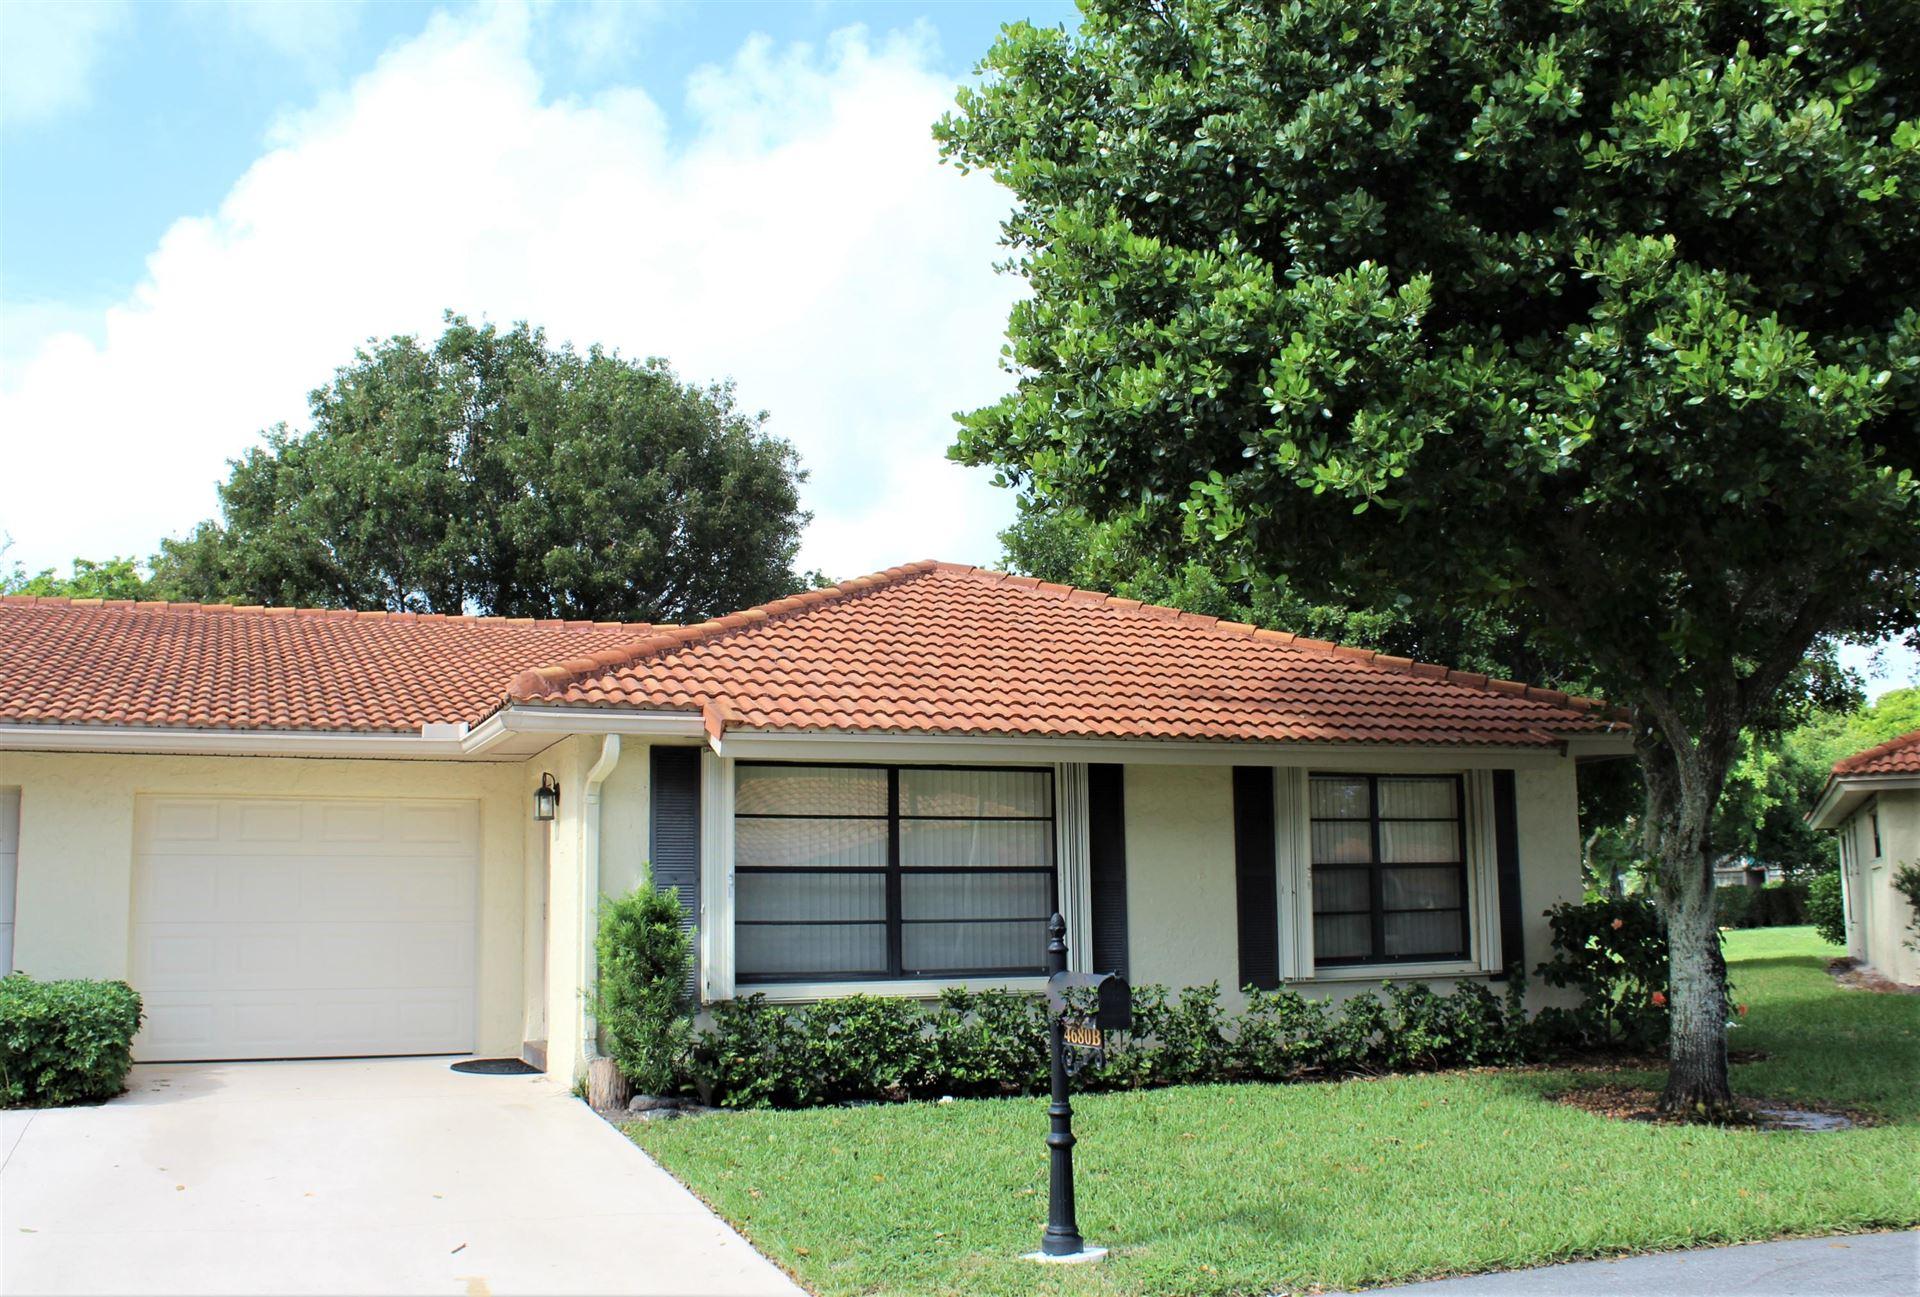 Photo of 4680 Rosewood Tree Court #B, Boynton Beach, FL 33436 (MLS # RX-10673375)